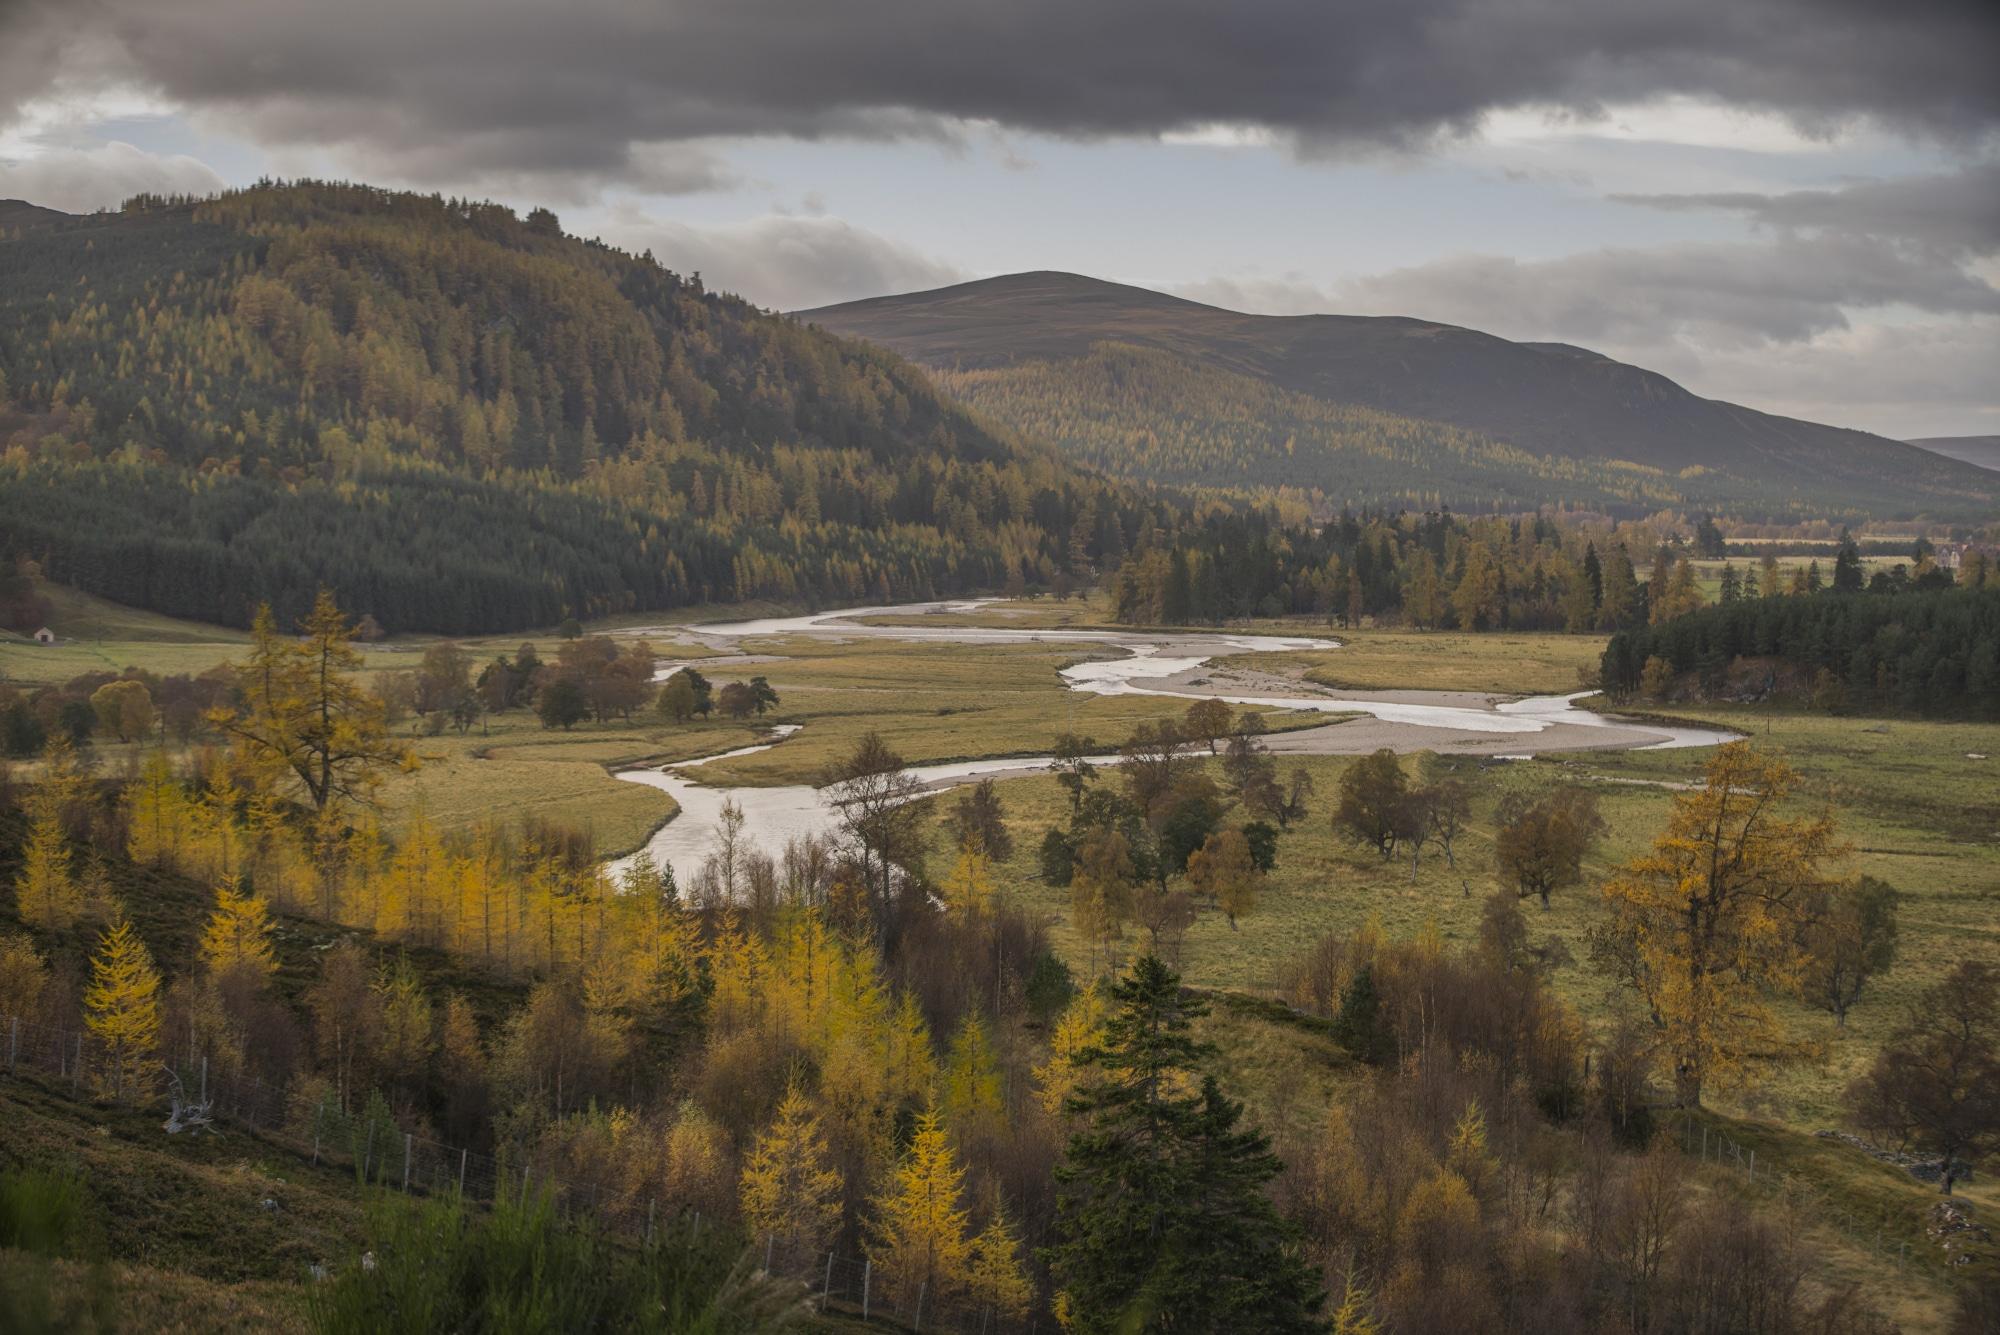 The Mars lodge estate, Braemar, Royal Deeside in the Cairngorms National Park.